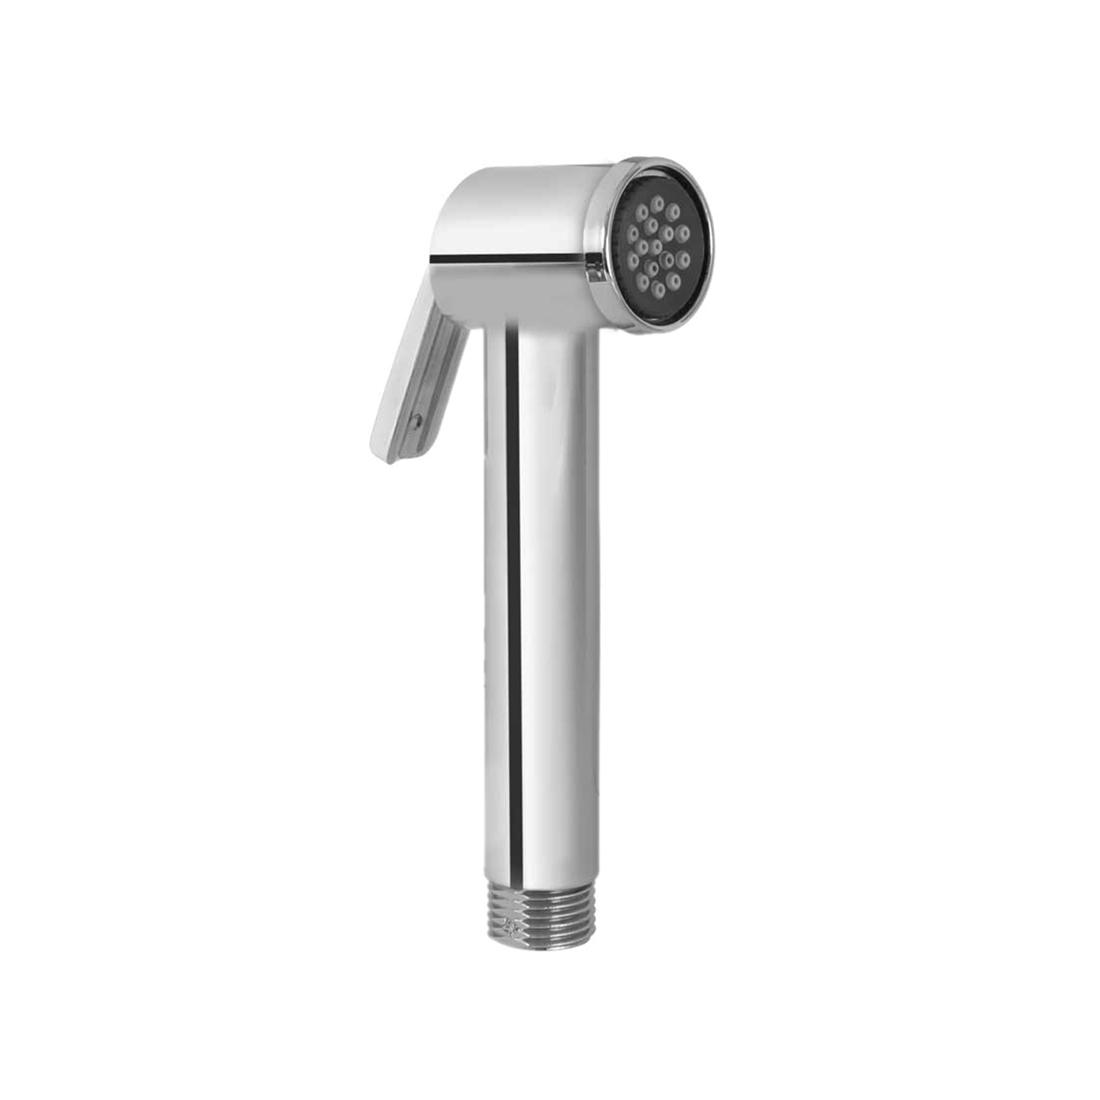 Kerovit KA580008 Lift-Up Trigger Function Health Faucet With Hook